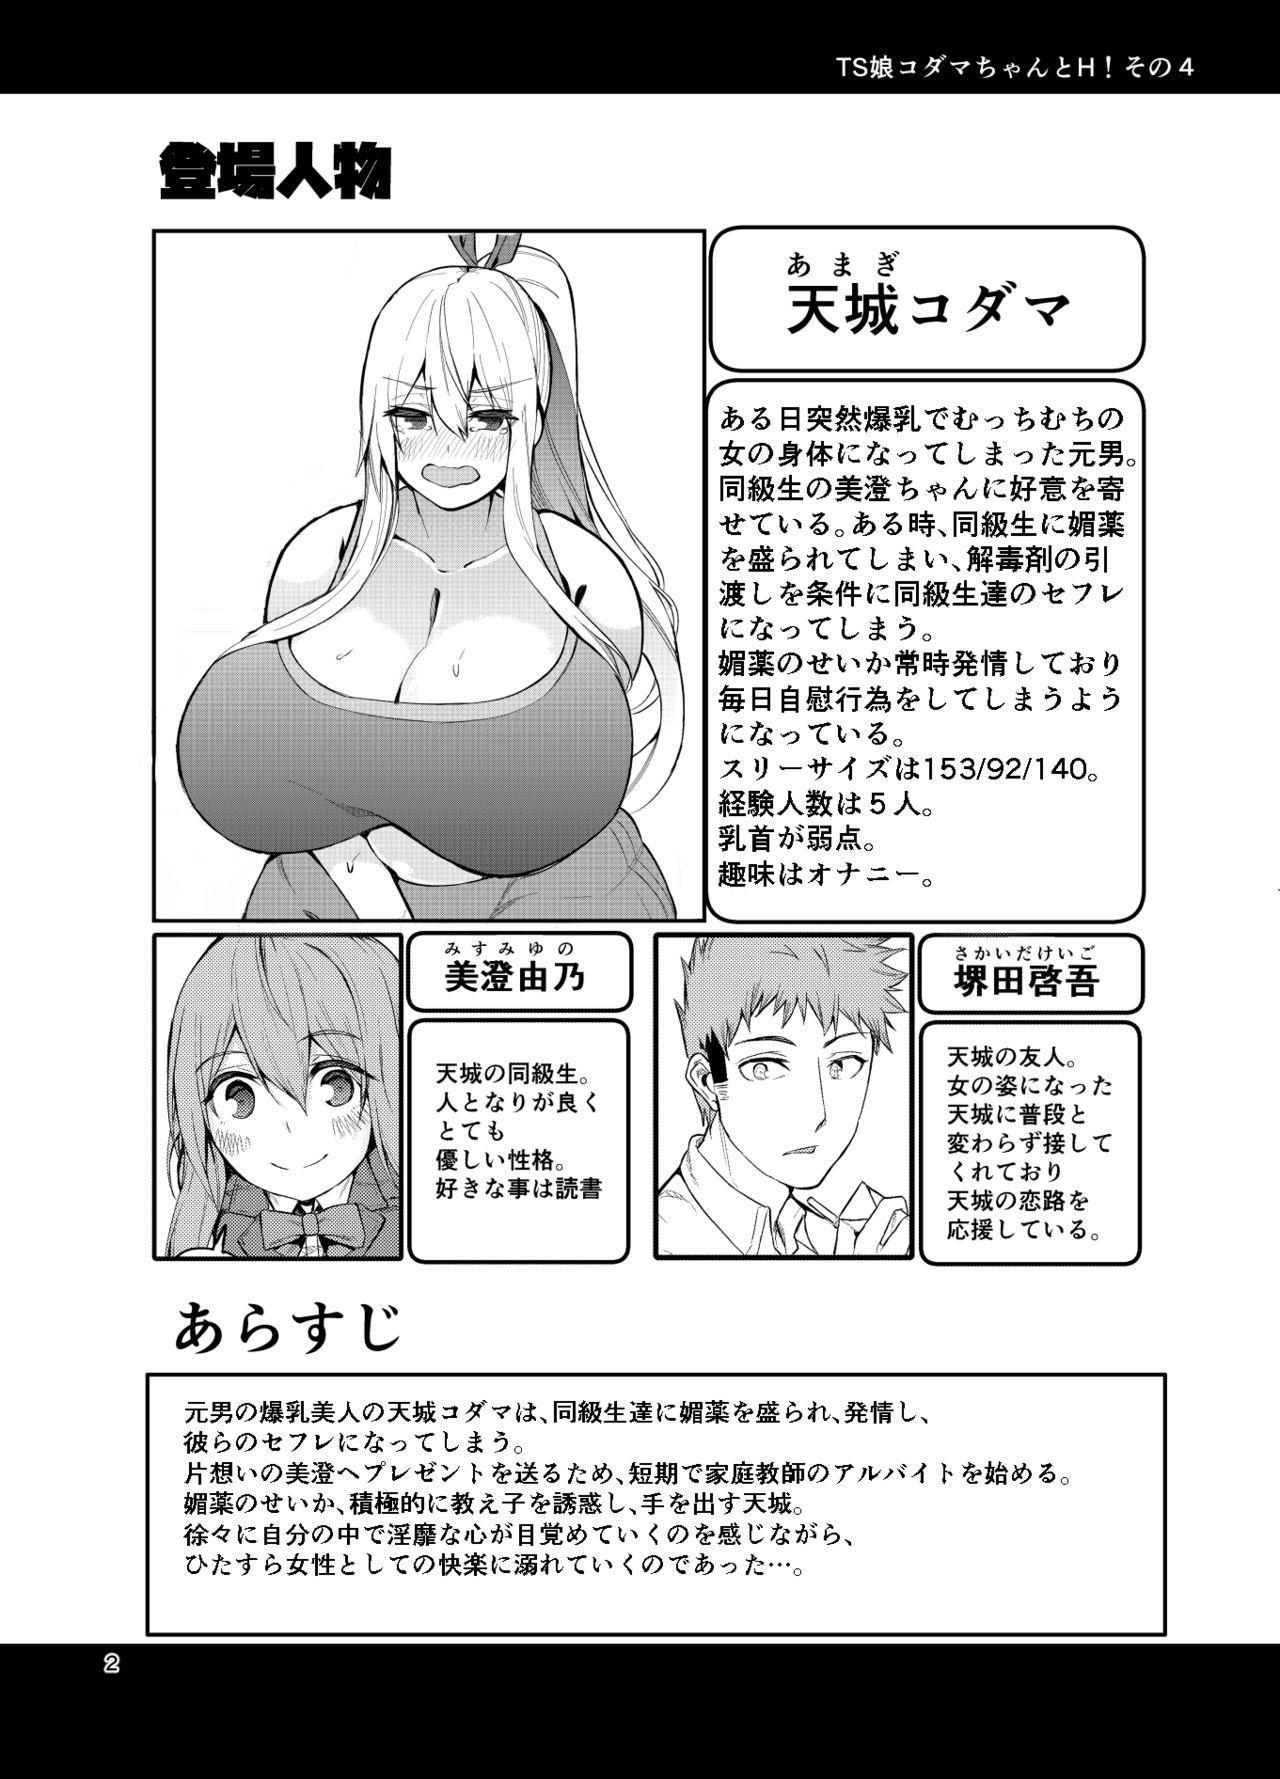 [Wakuseiburo (cup-chan)] TS Musume Kodama-chan to H! Sono 4 | TS Girl Kodama-chan and Ecchi! Part 4 [Digital] 2